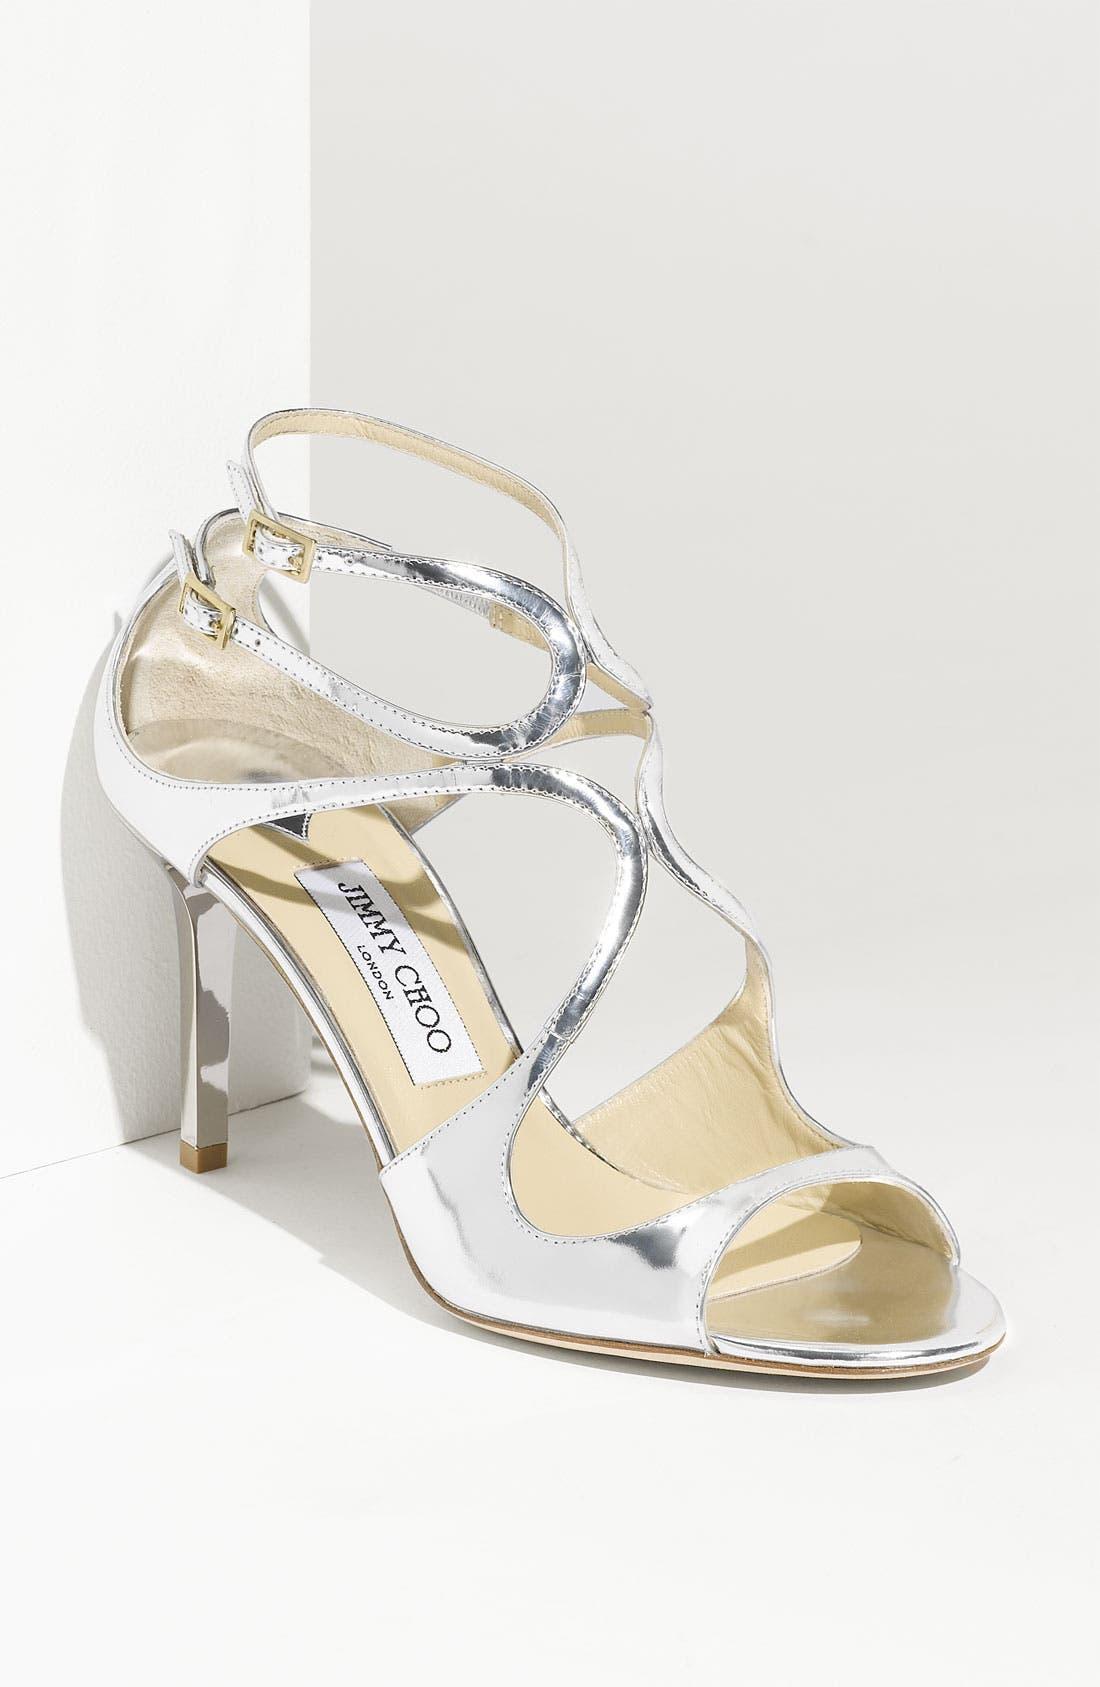 'Ivette' Strap Sandal,                             Main thumbnail 1, color,                             040